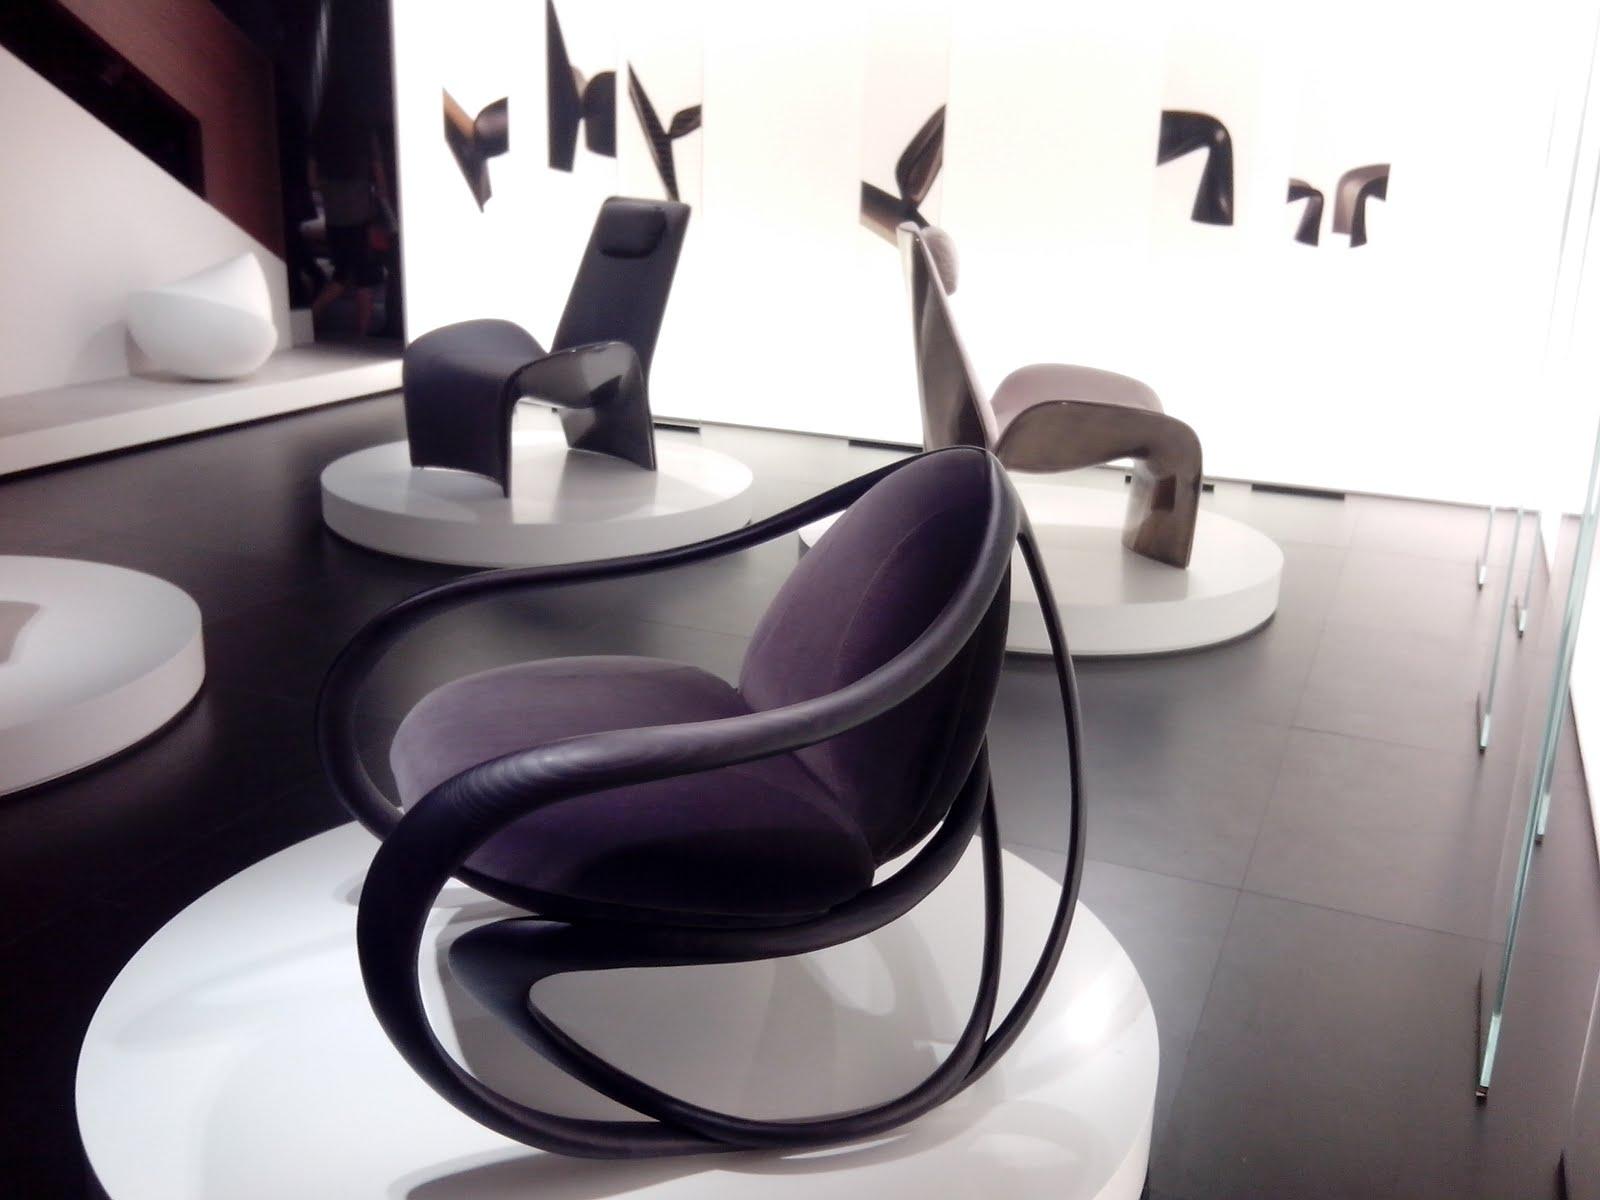 Salone del Mobile в Милане